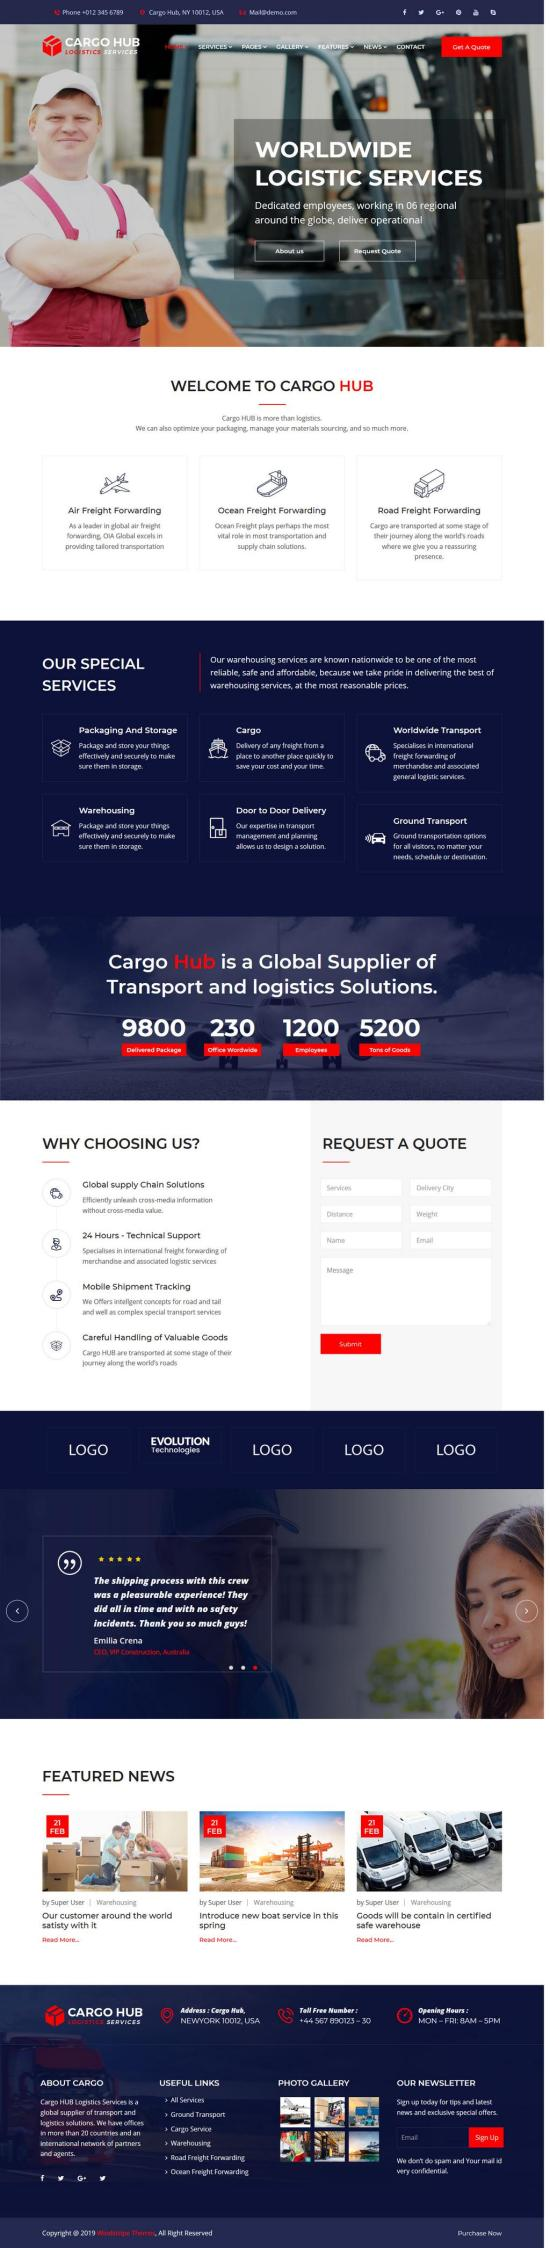 cargo hub joomla template 01 - Cargo HUB Joomla Template